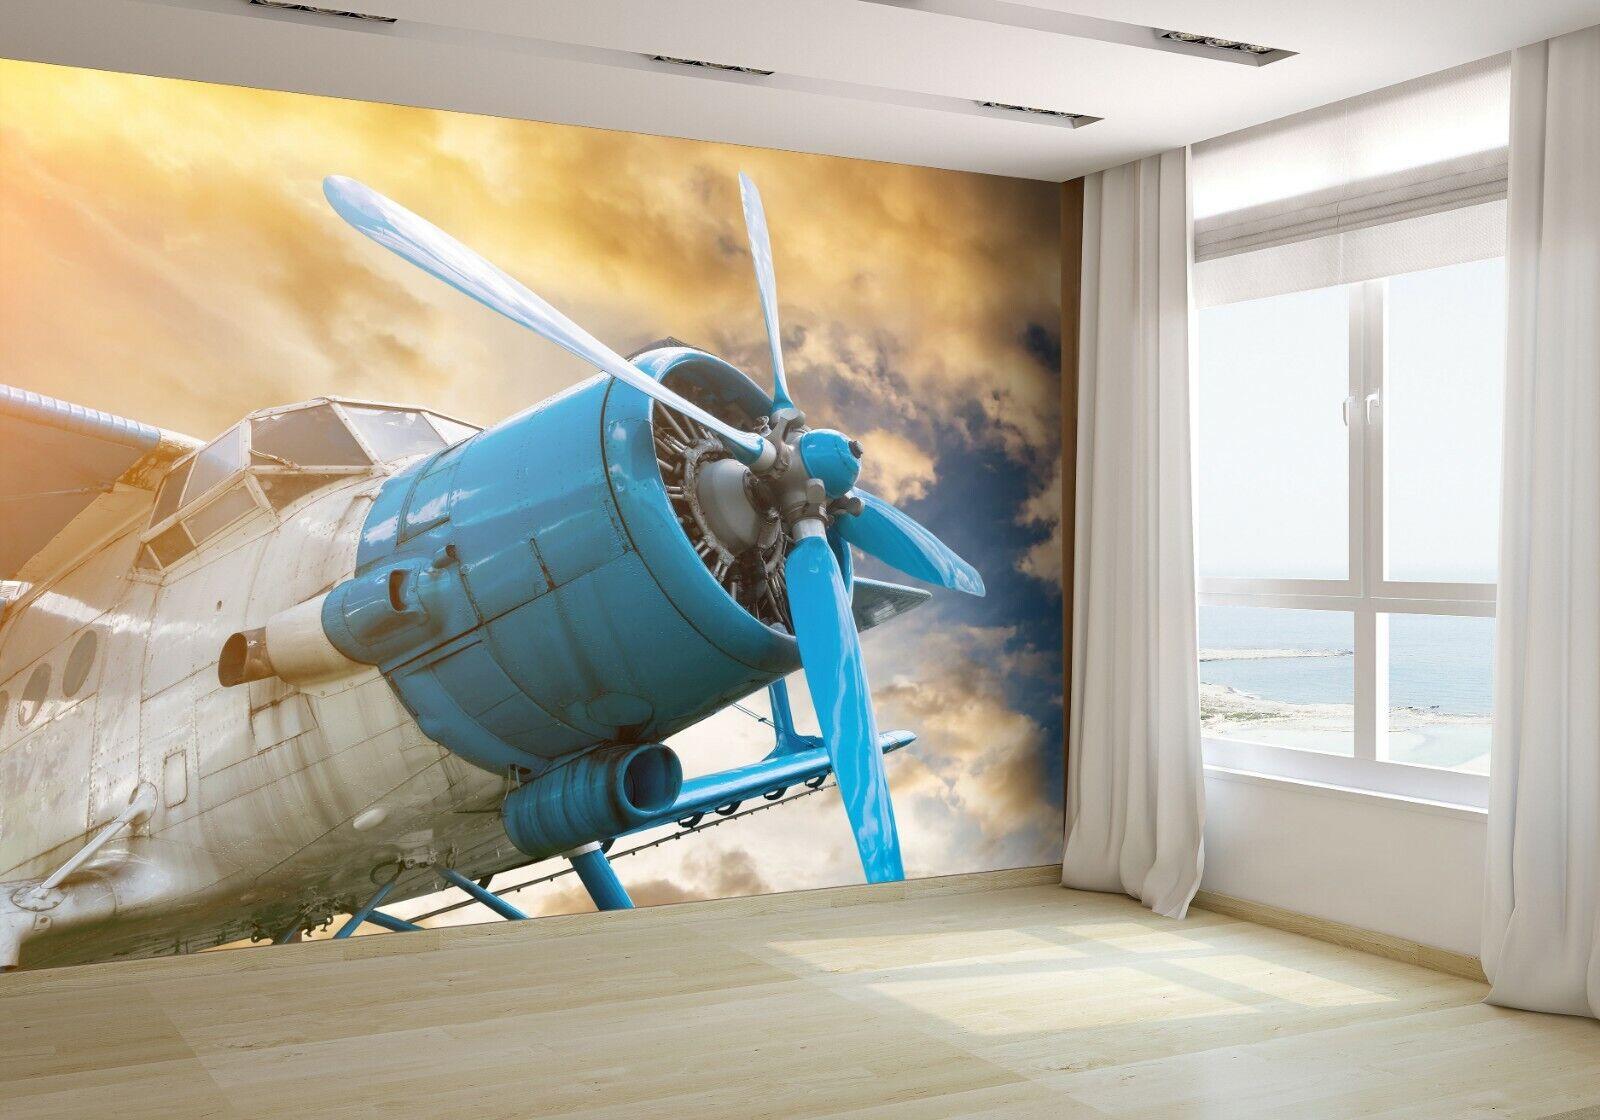 Plane With Propeller Wallpaper Mural Photo 76477212 premium paper